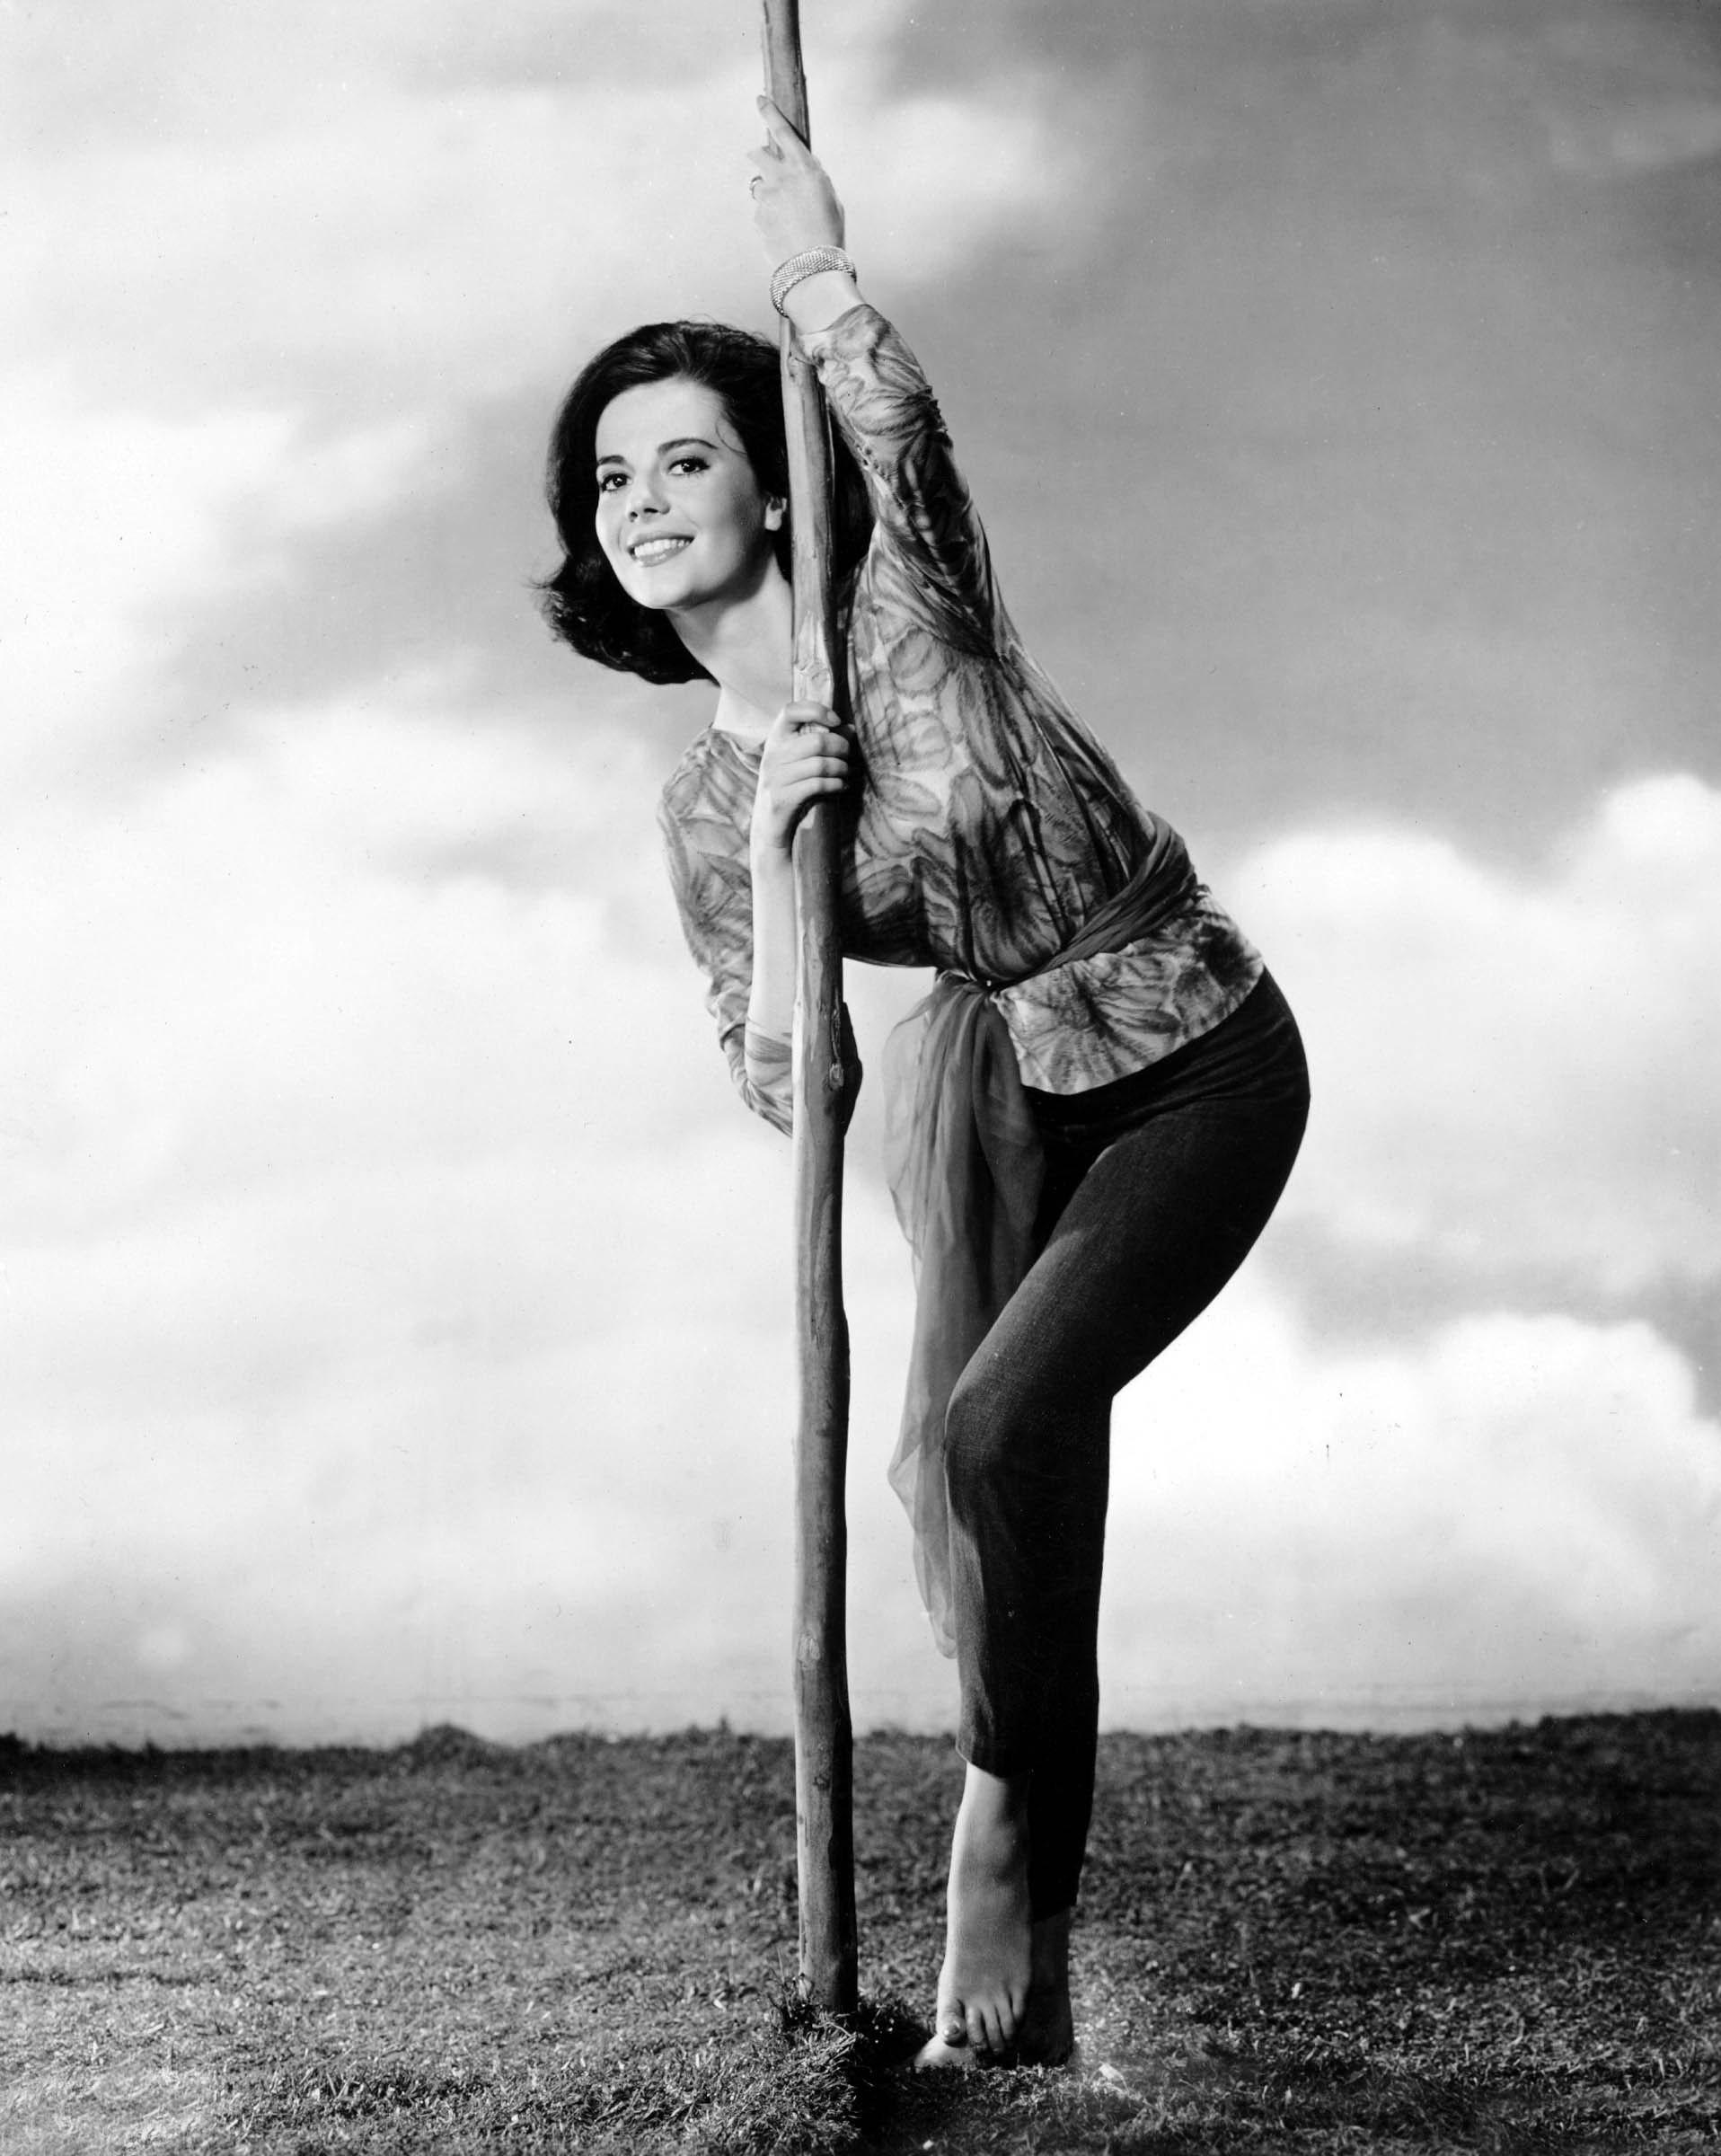 https://pics.wikifeet.com/Natalie-Wood-Feet-939892.jpg